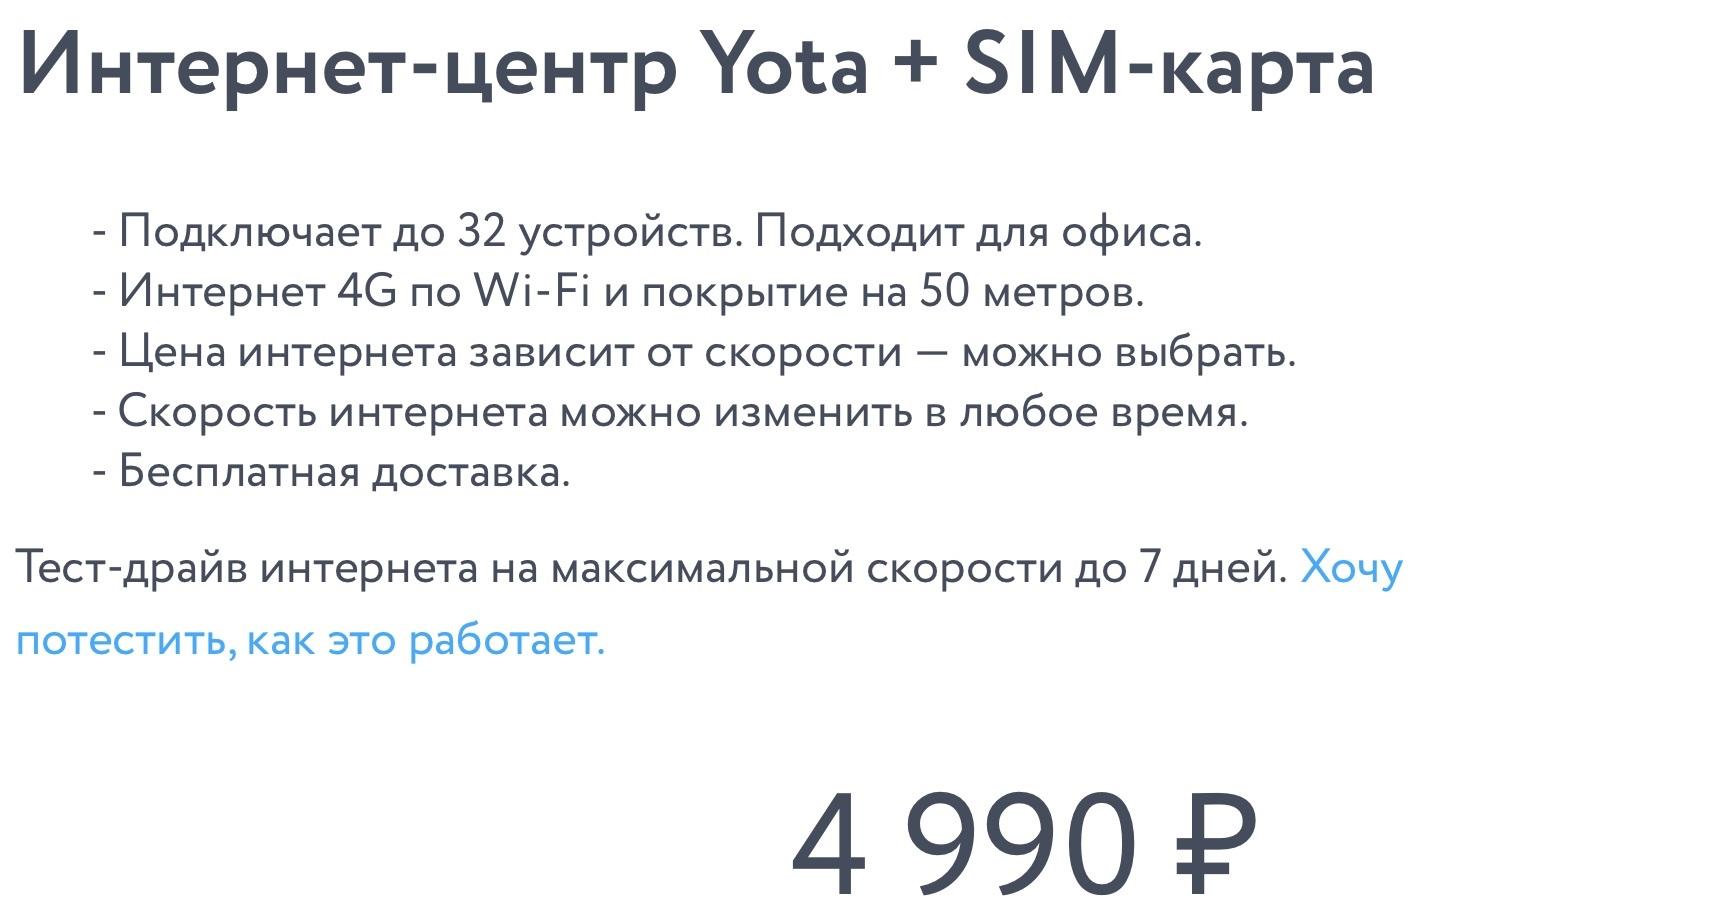 Интернет-центр-Yota-26260-MIMO-3g-4g-antenna-ru-sotovaya-надо улучшить 4G